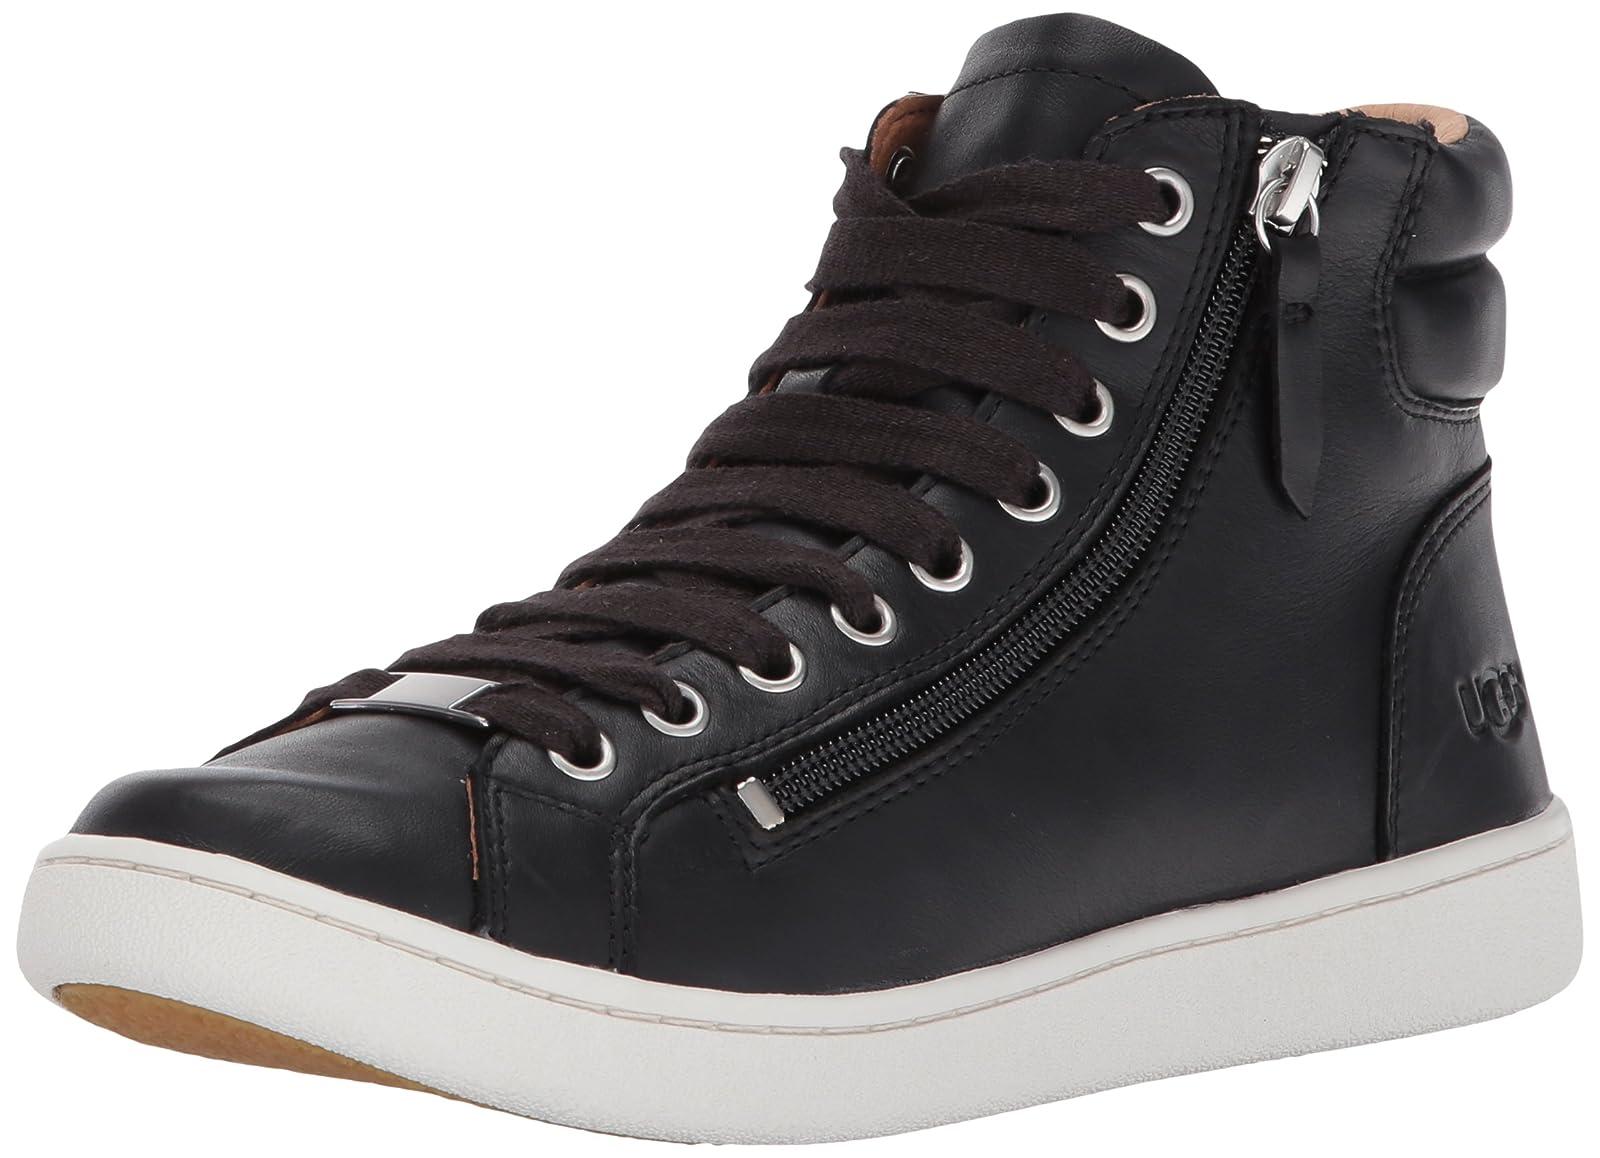 8f0ae1d5ee7 UGG Women's Olive Fashion Sneaker black black